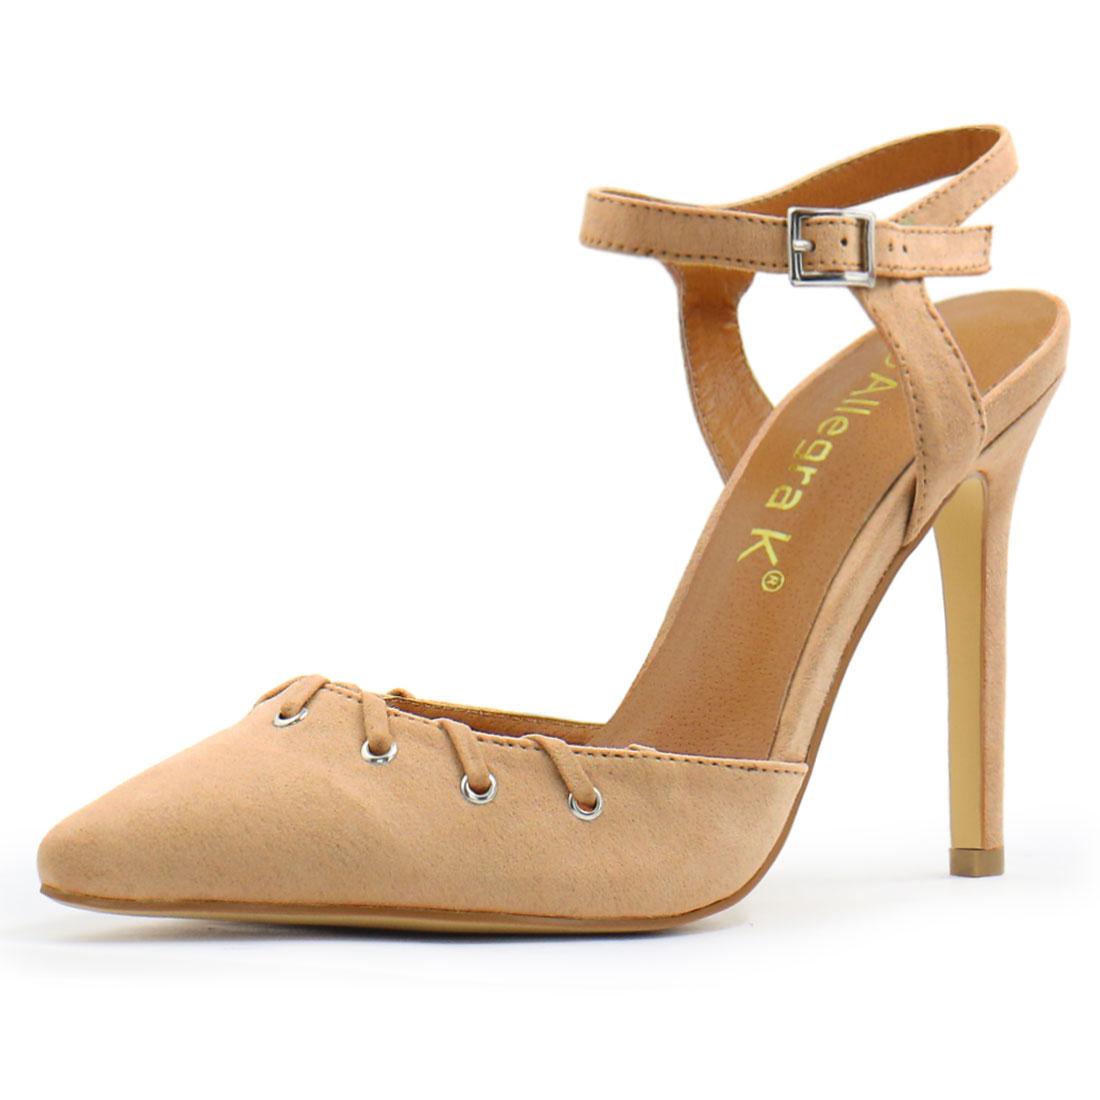 Women Pointed Toe Stiletto Lace Up Decor Ankle Strap Pumps Beige US 8.5